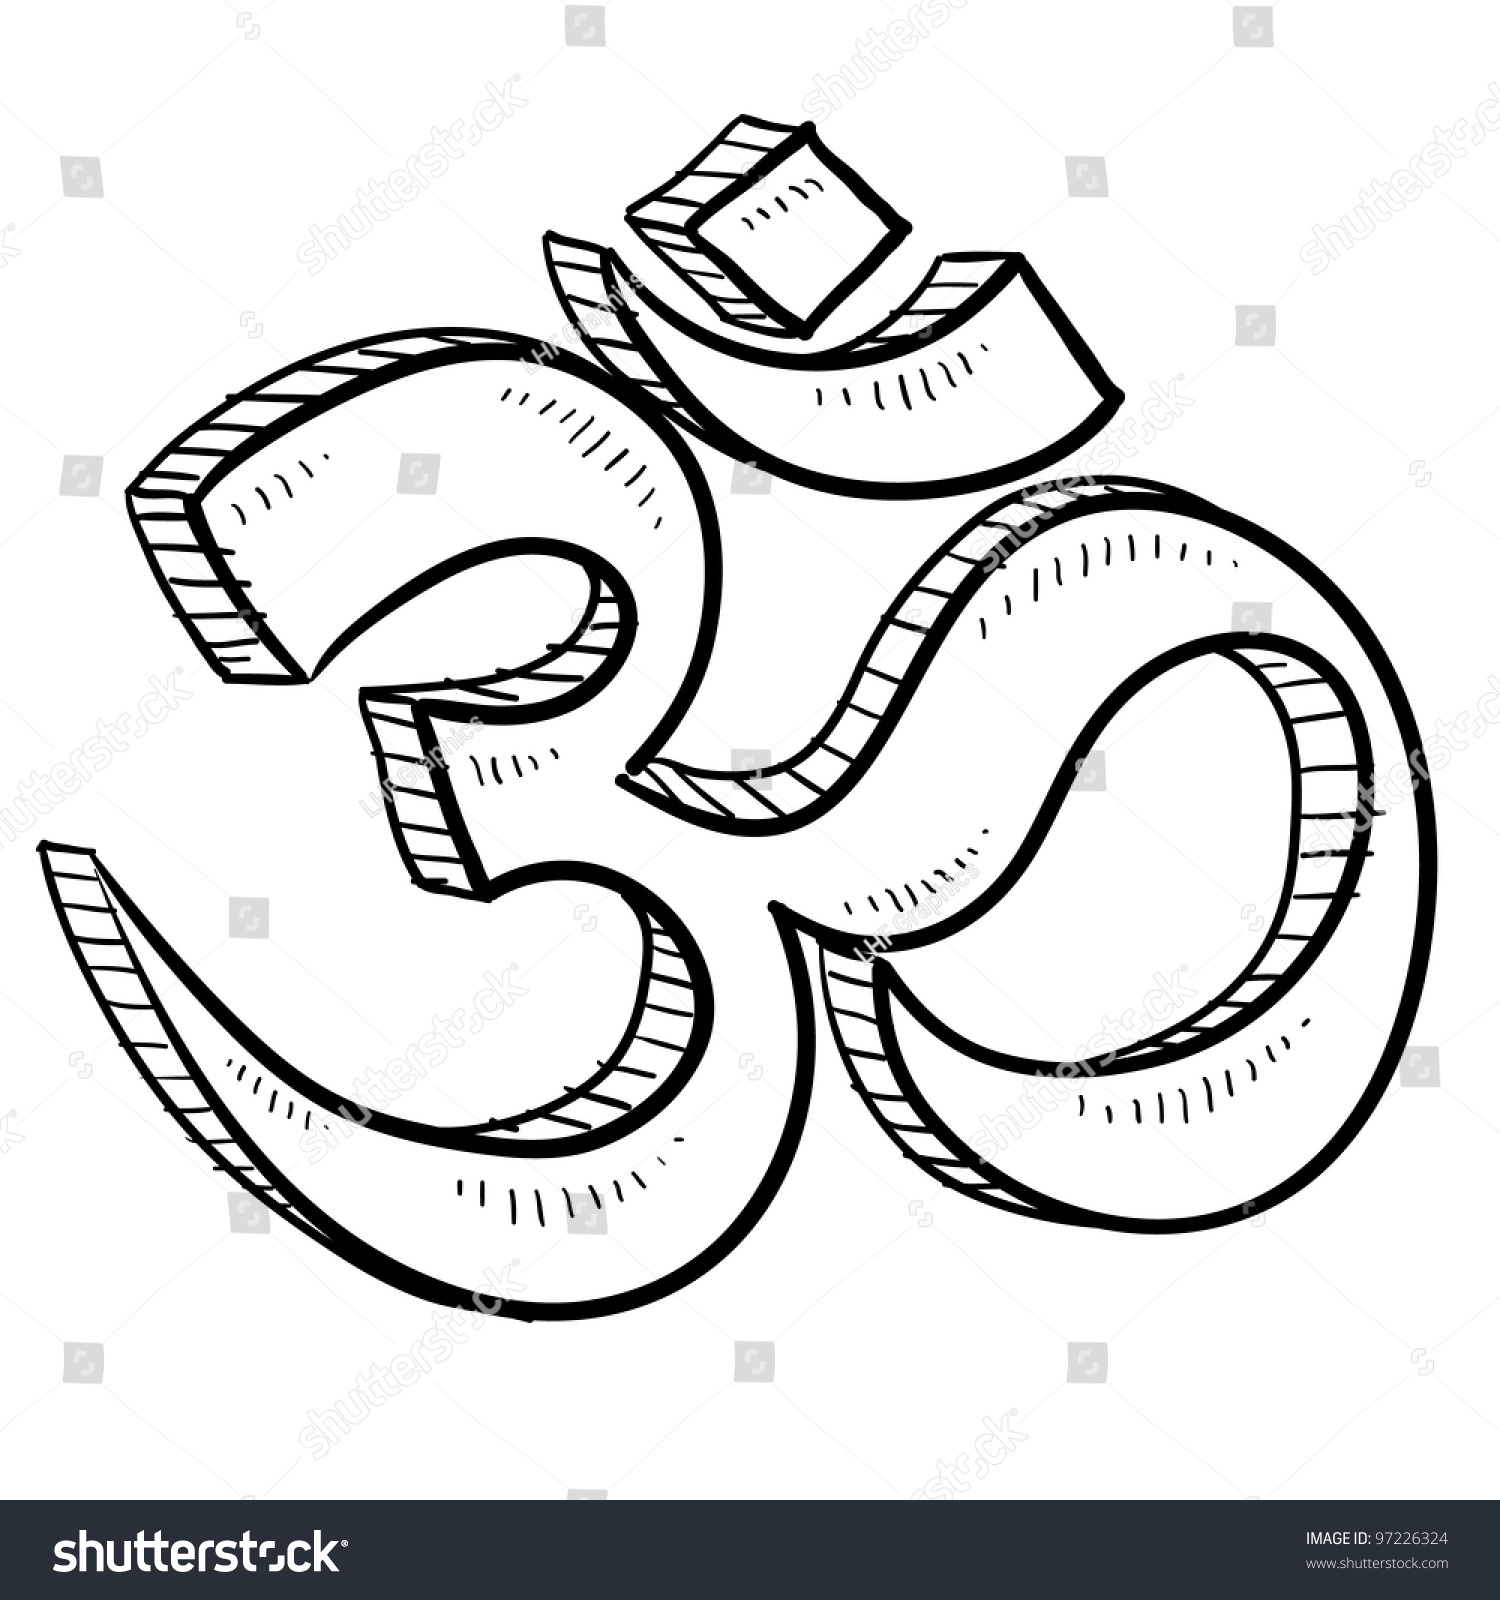 Doodle Style Hindu Om Yoga Symbol Stock Vector 97226324 - Shutterstock